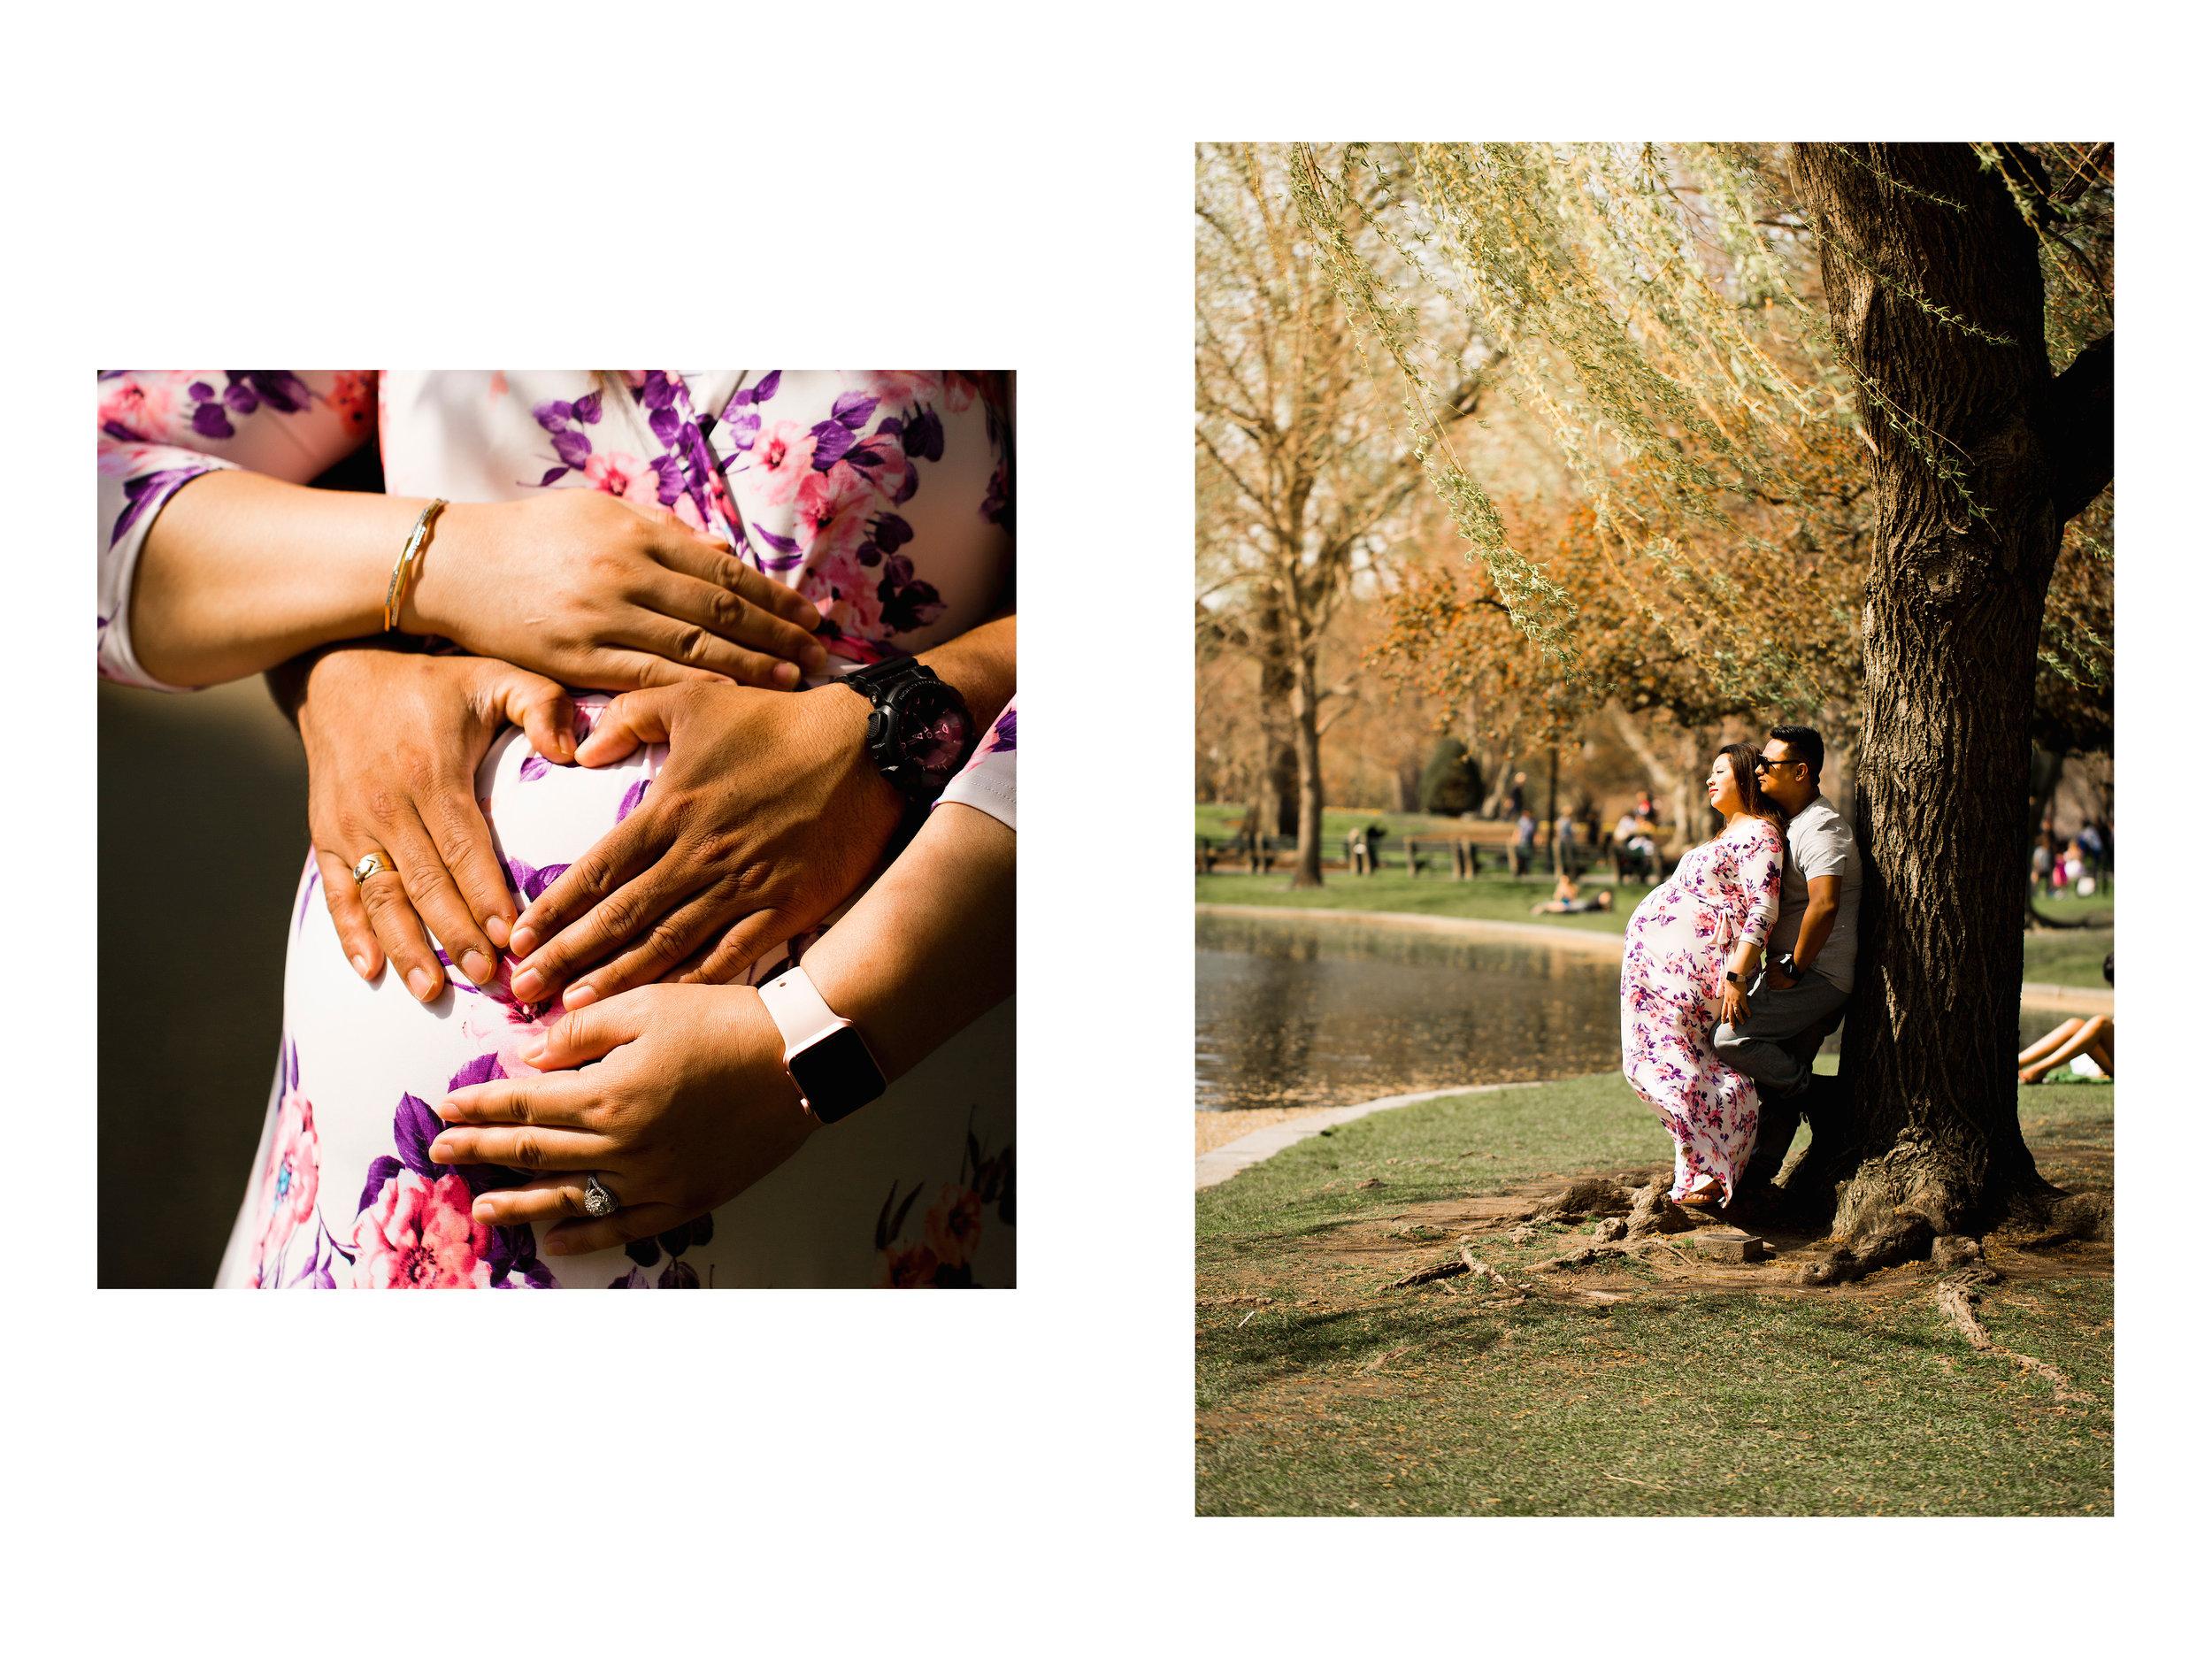 Rtubasnet_Reeto_&_Vikrant_Vik's_Maternity_Album_2_05.jpg